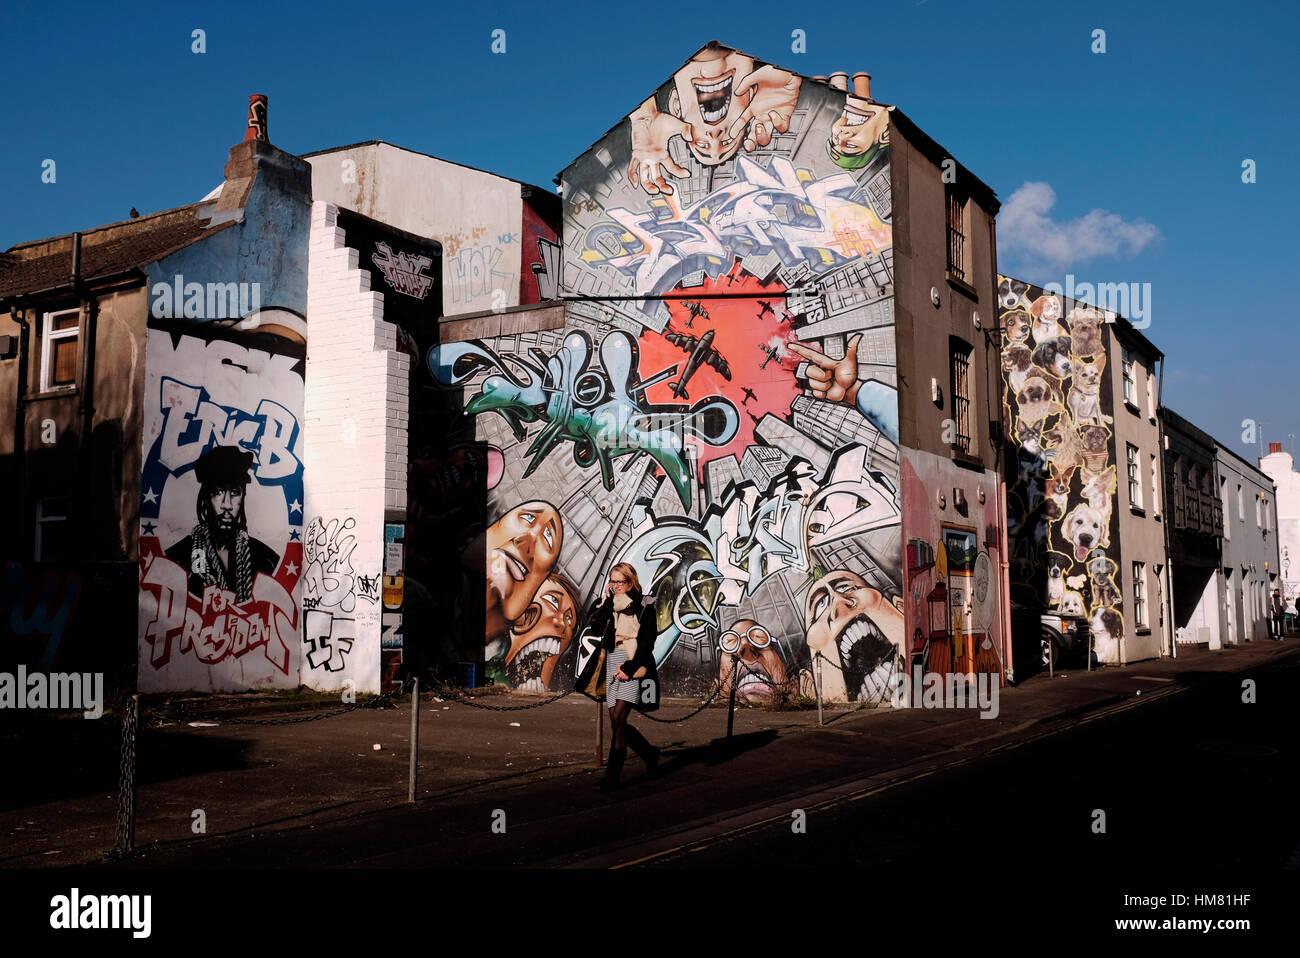 Vivid graffiti art on walls in kensington street brighton part of the bohemian north laine district